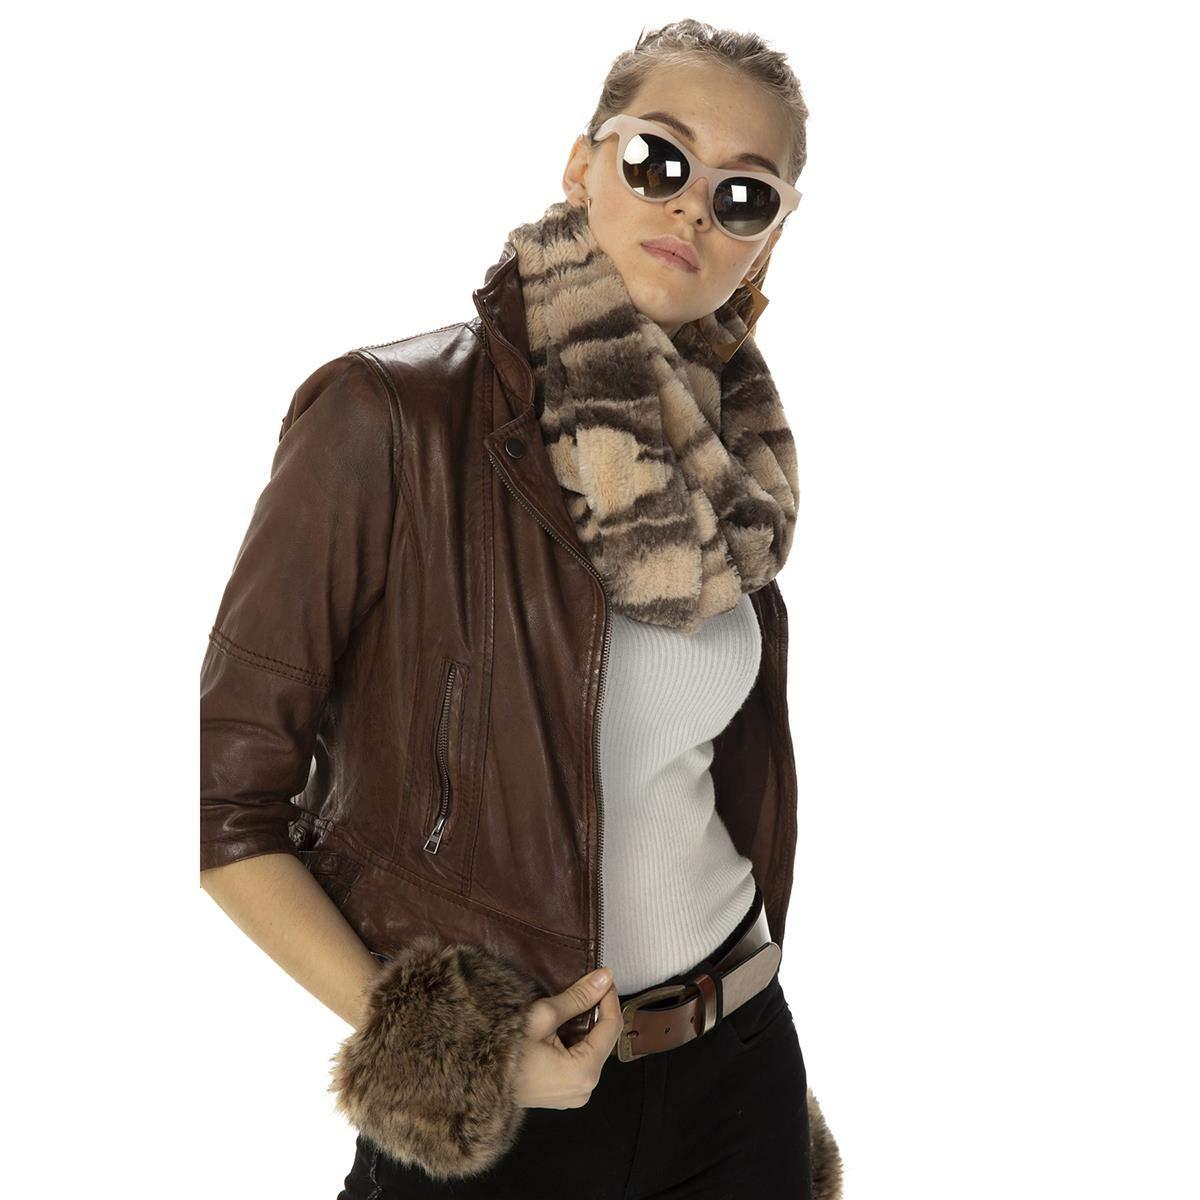 Miramar Women's Winter Infinity Scarf Fashion Circle Loop Scarves Thick Warm 11001 Beige